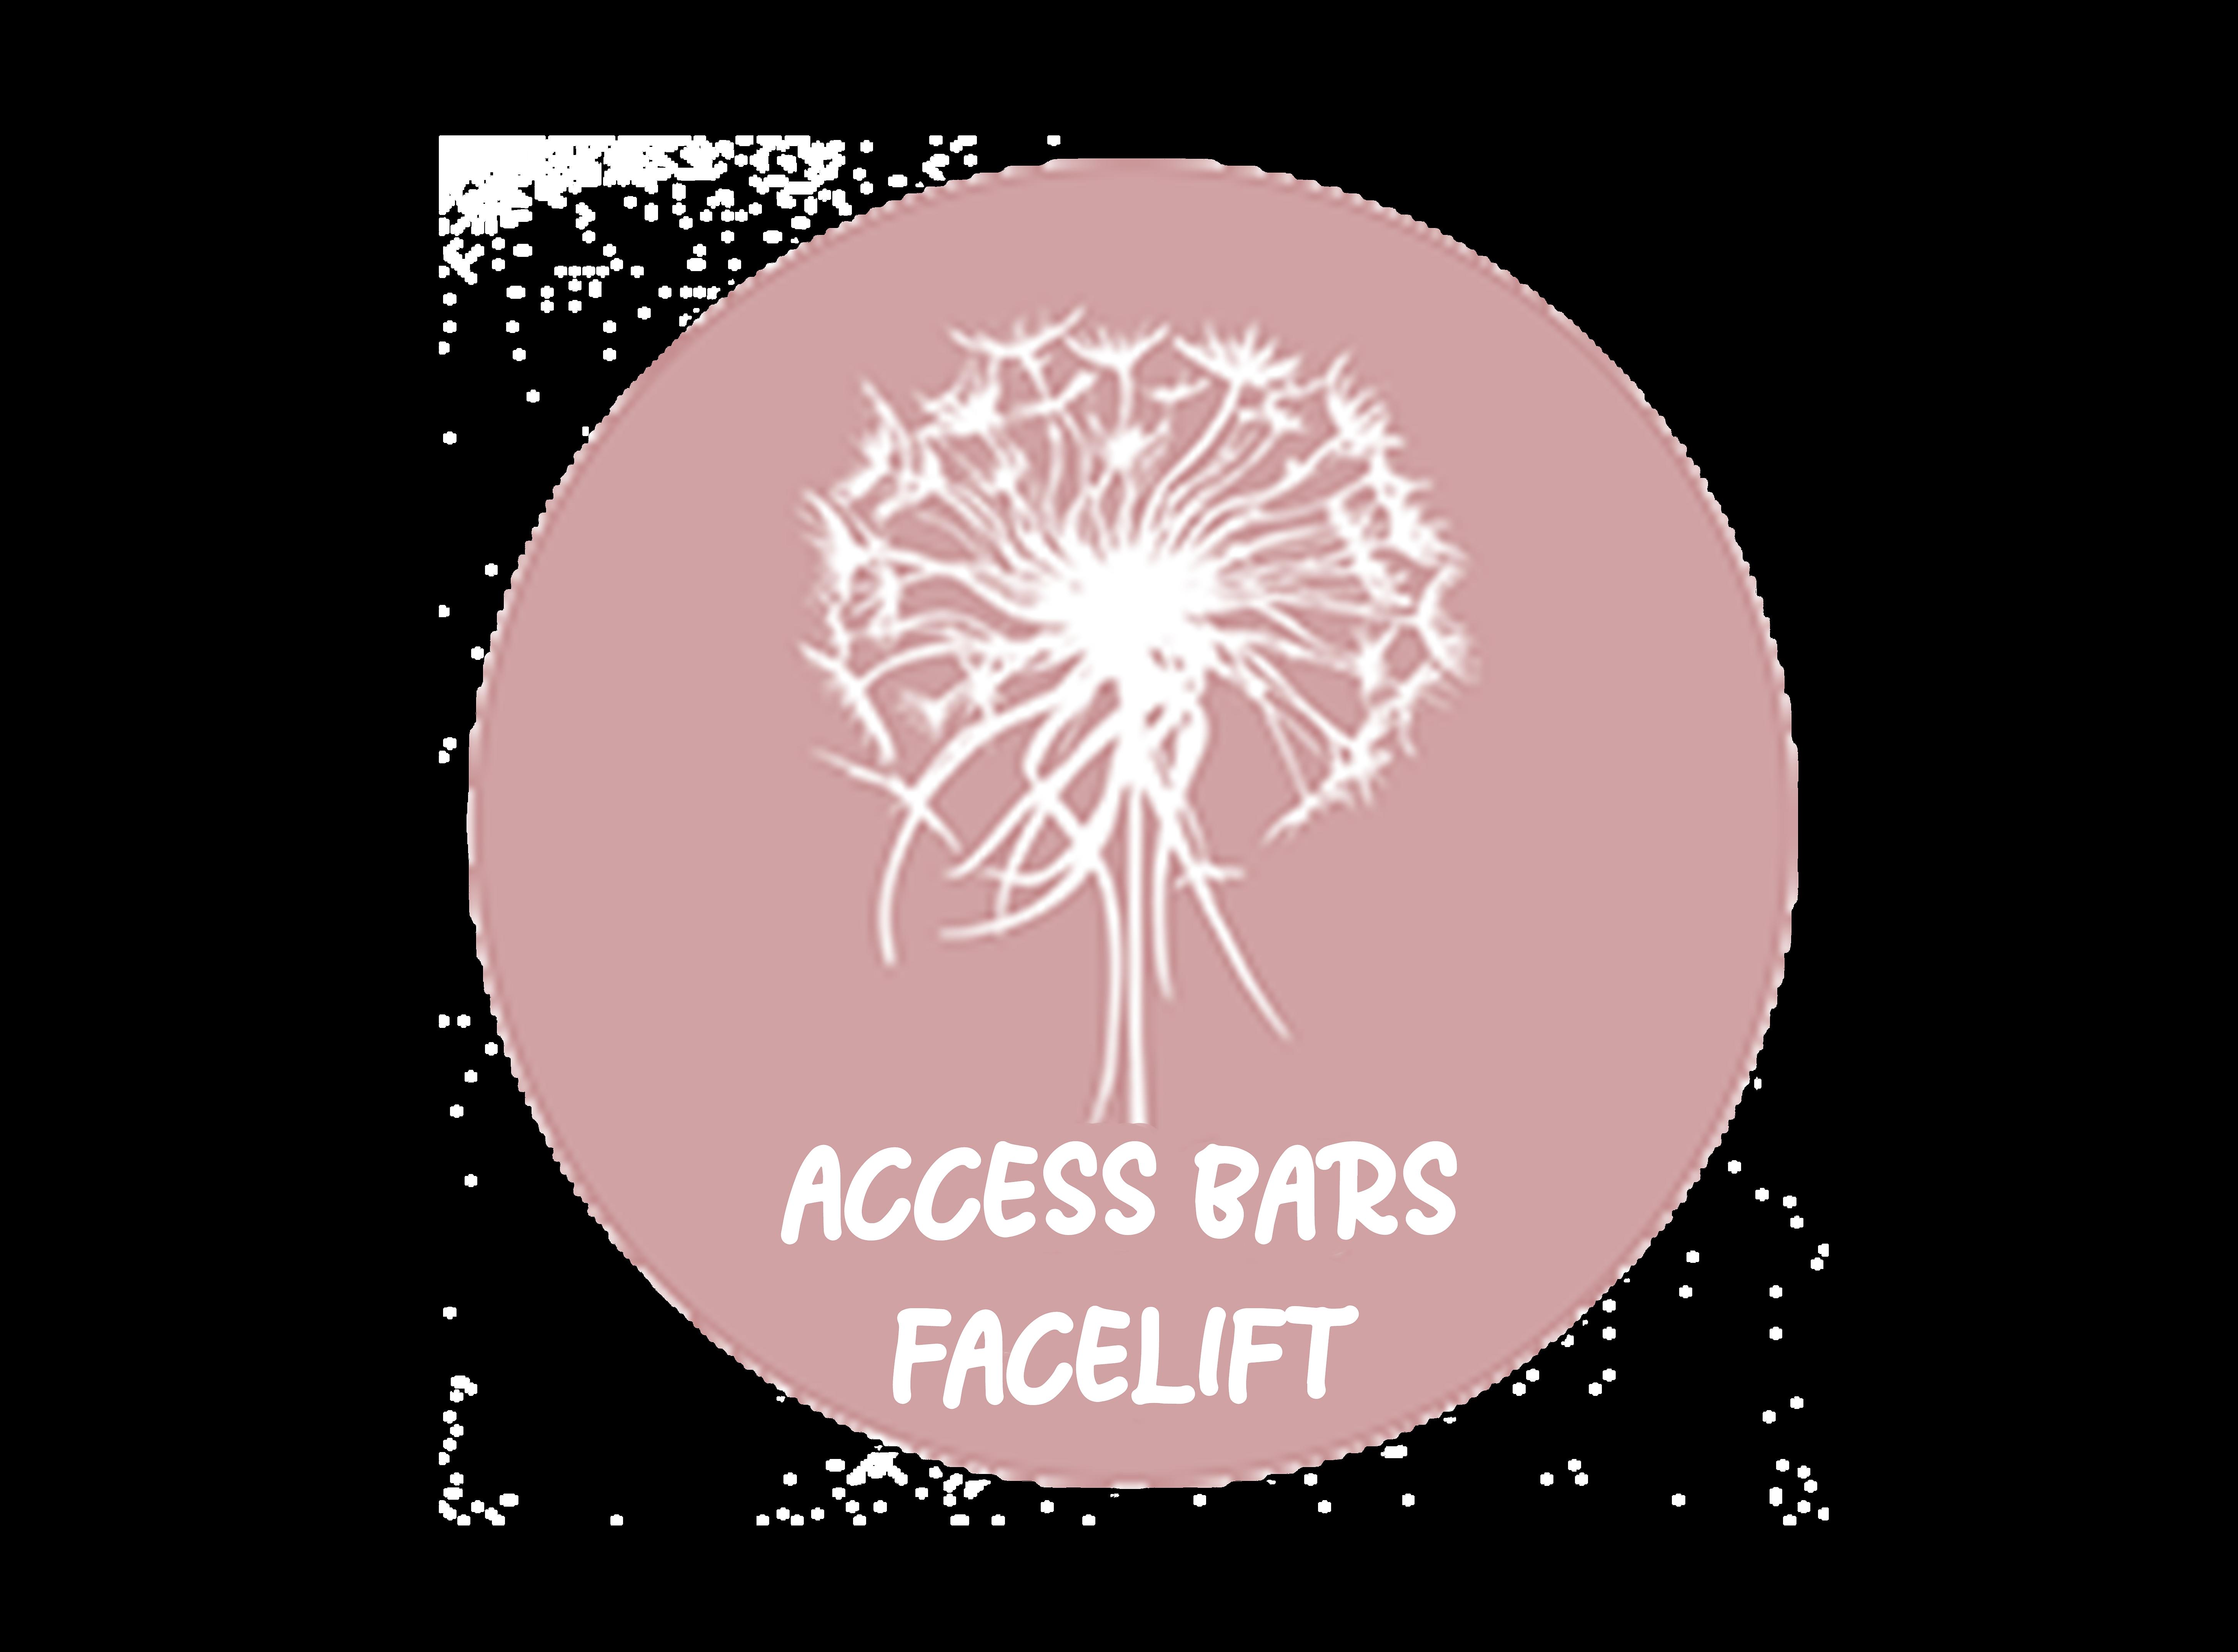 Access Bars ou Facelift